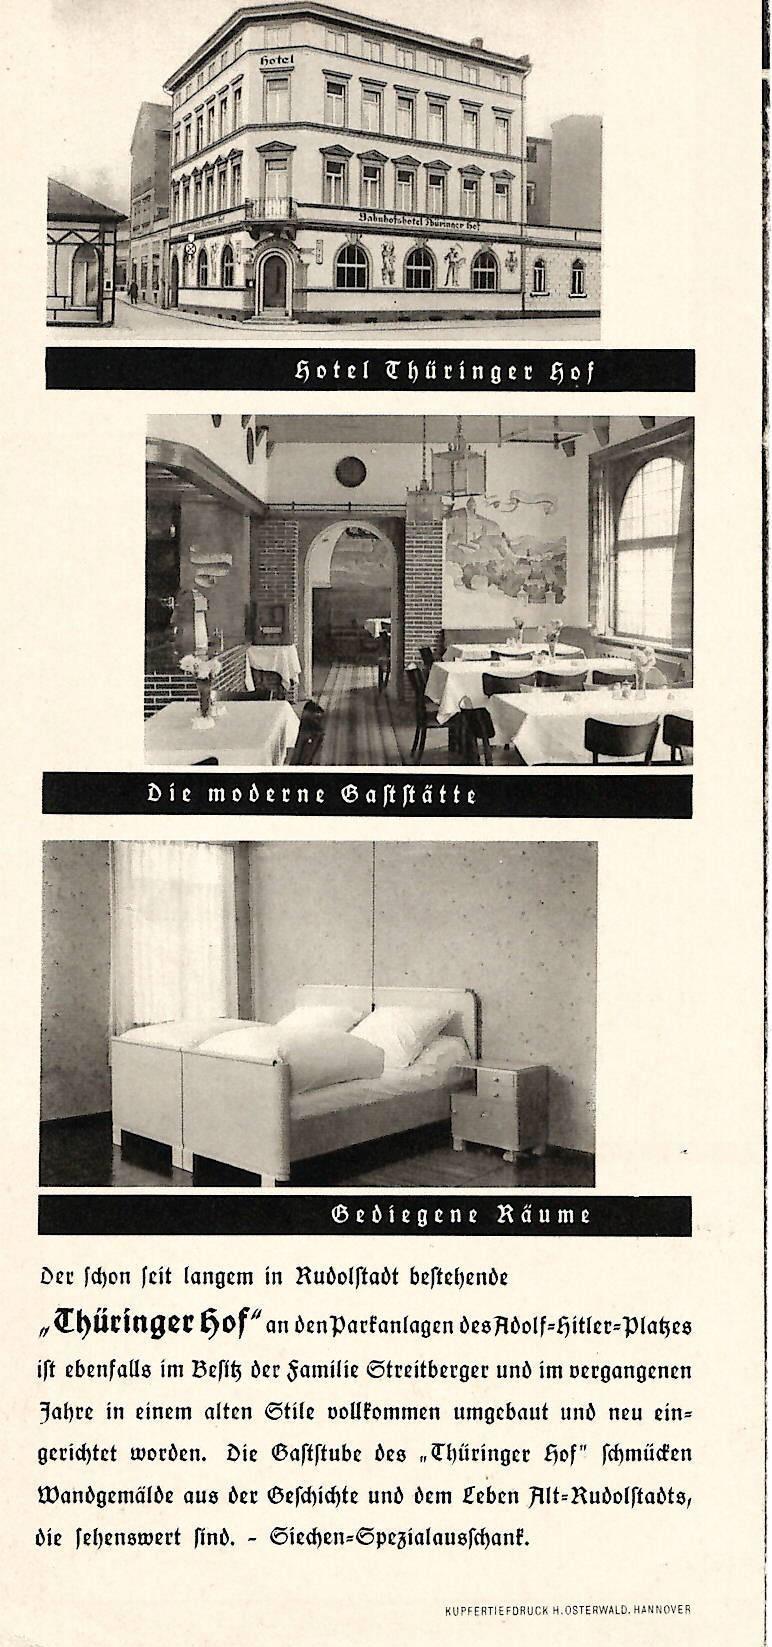 "The chronicle of the hotel ""Thüringer Hof"" in Rudolstadt - A brochure of the Thüringer Hof Rudolstadt from 1938"